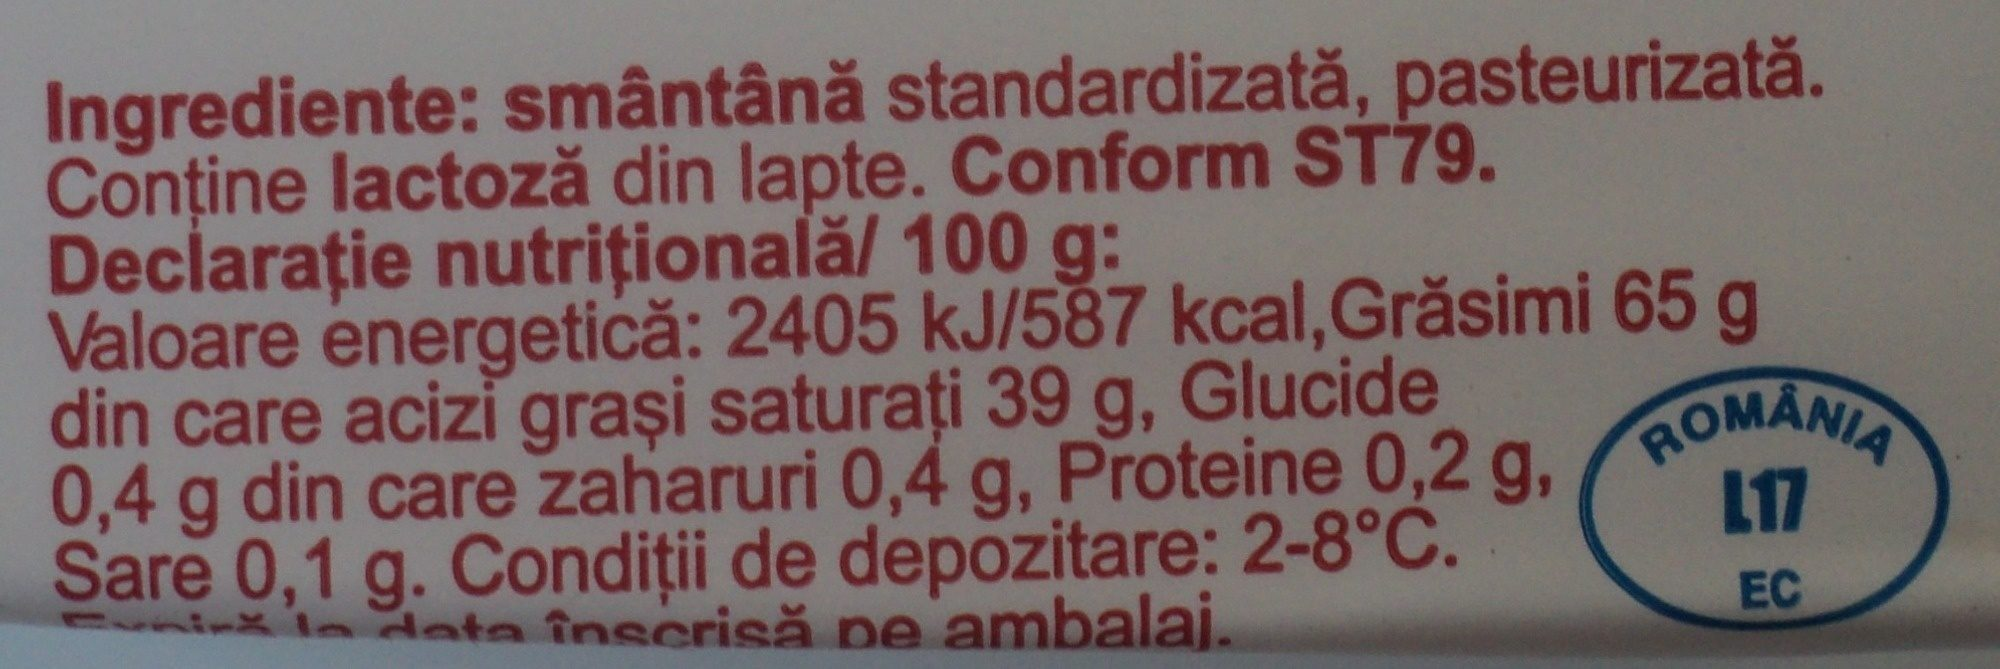 Albalact Unt de masa tip B 200g - Ingredients - ro